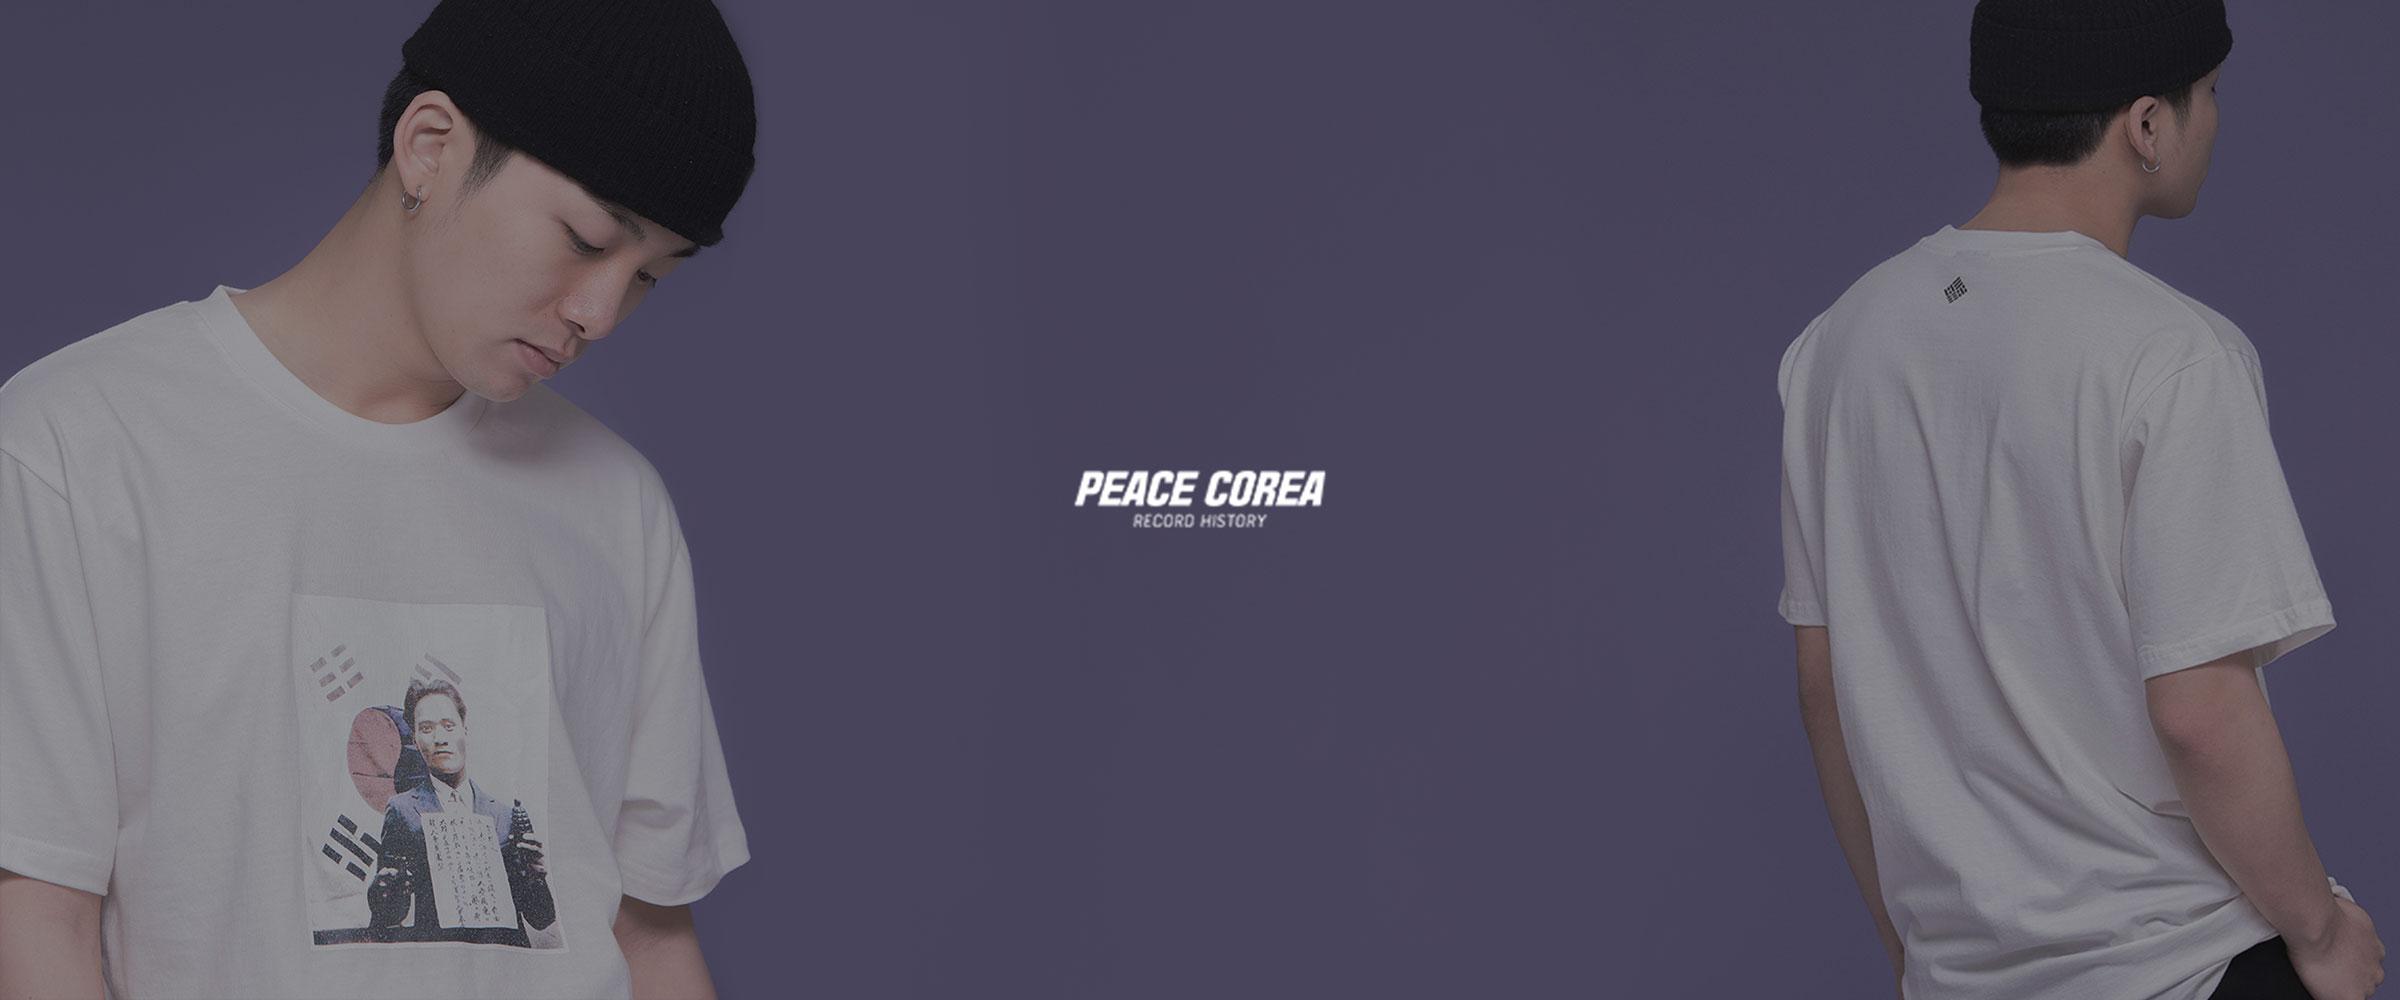 peacecorea.jpg